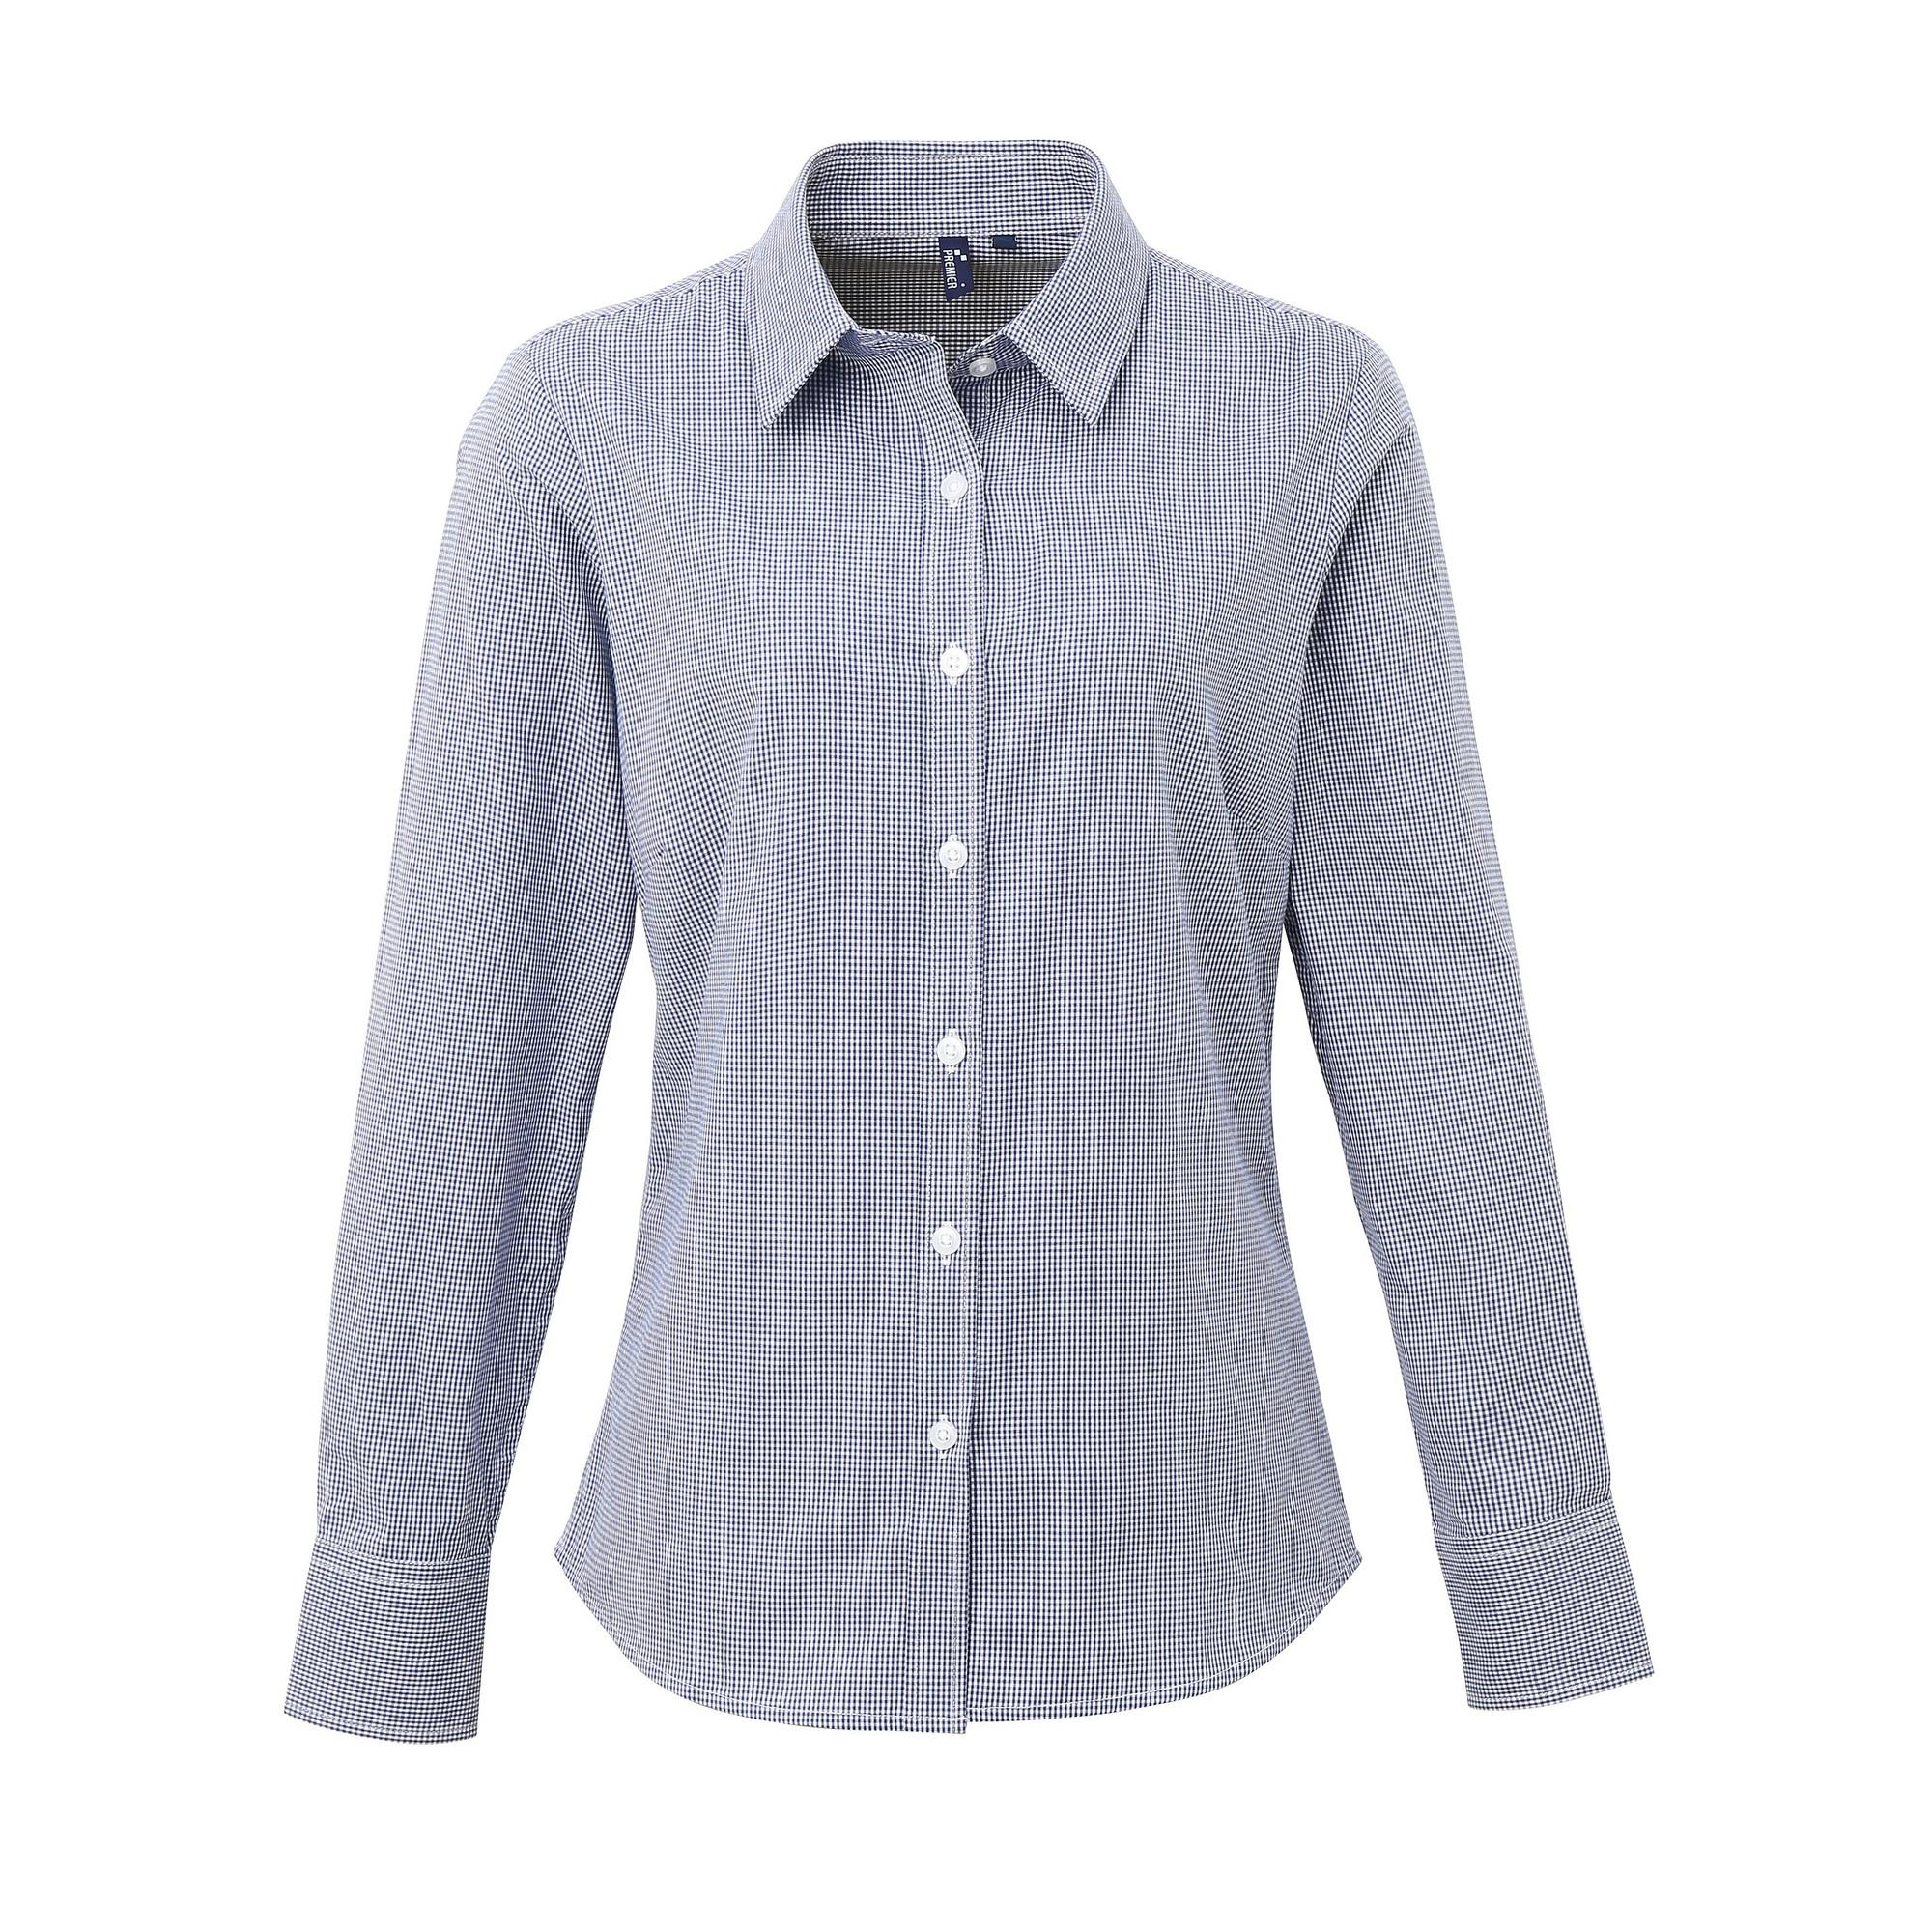 Premier Womens/Ladies Microcheck Long Sleeve Shirt (L) (Navy/White)